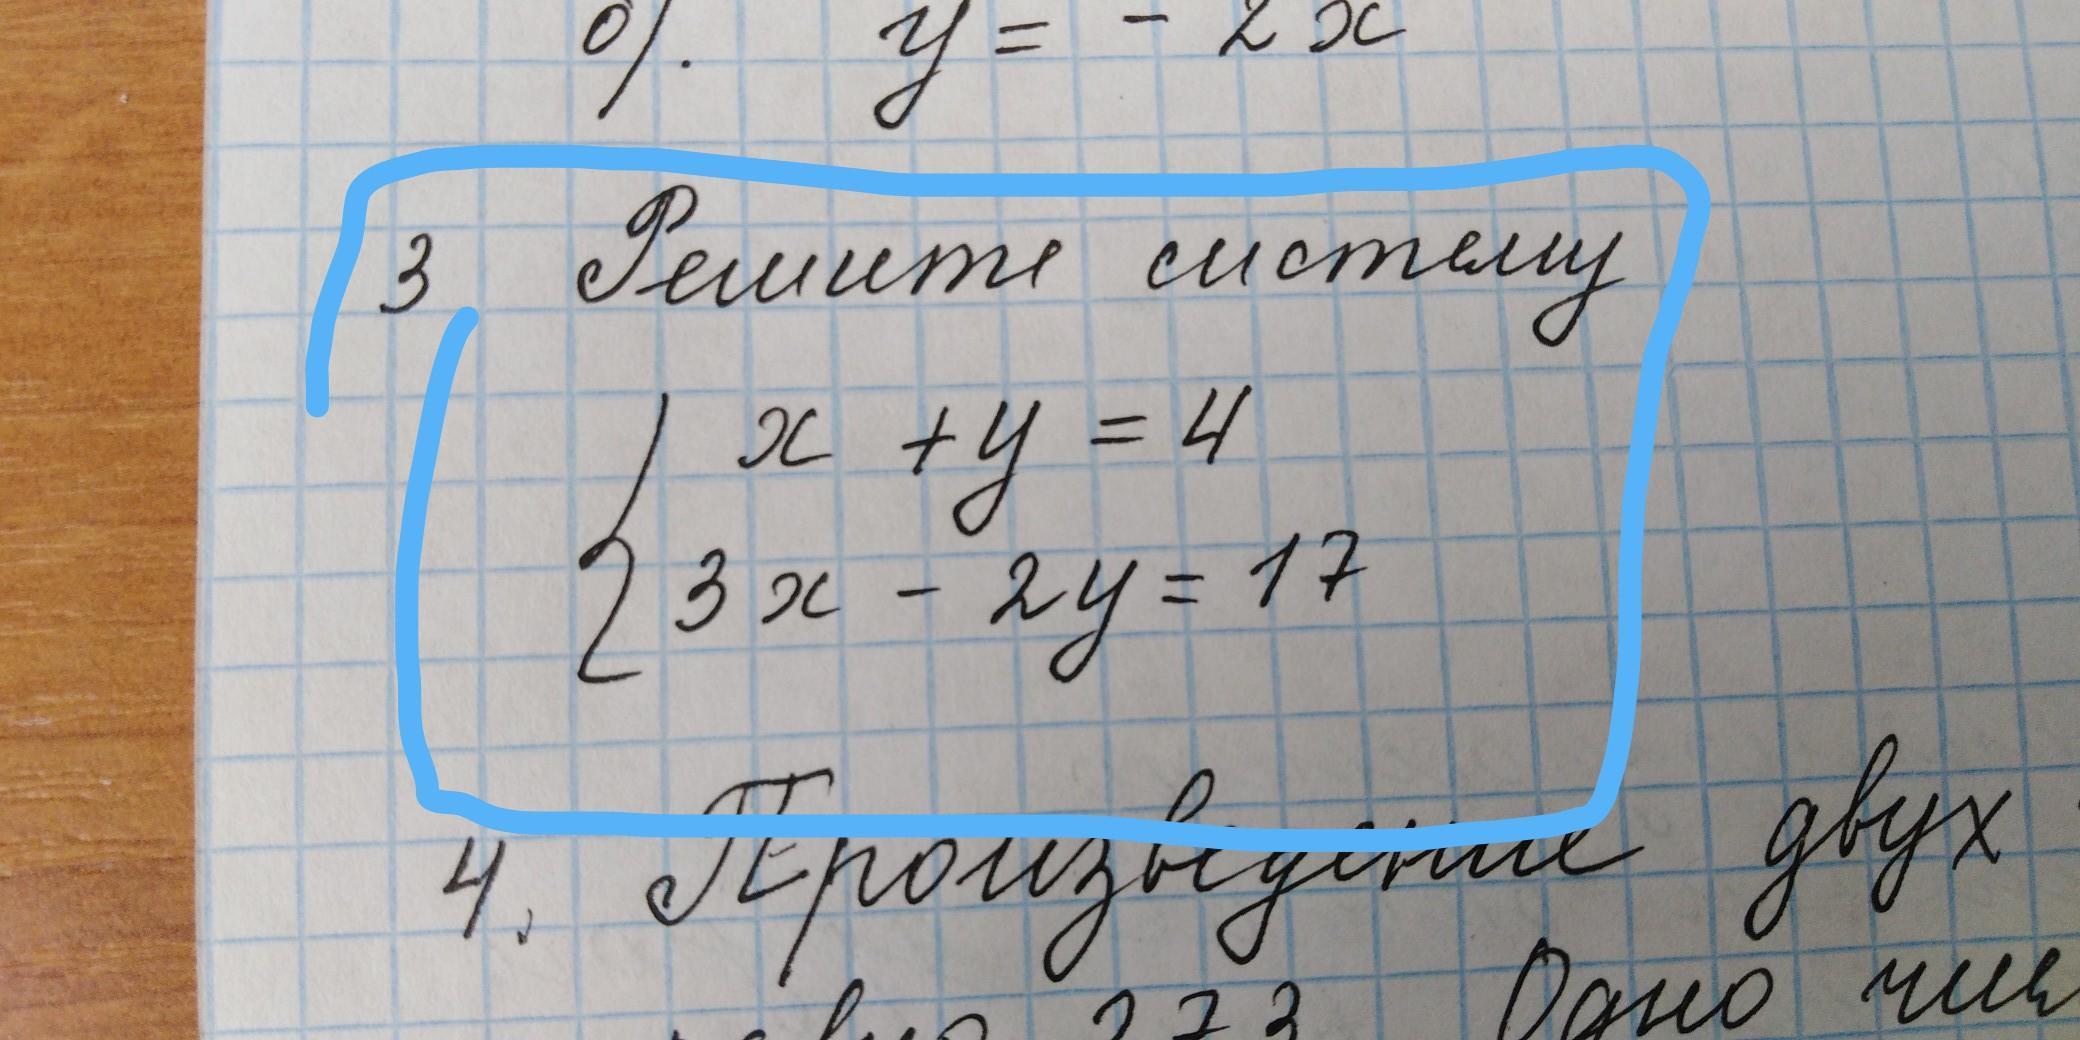 Решите уравнение x+y=4 3x-2y=17